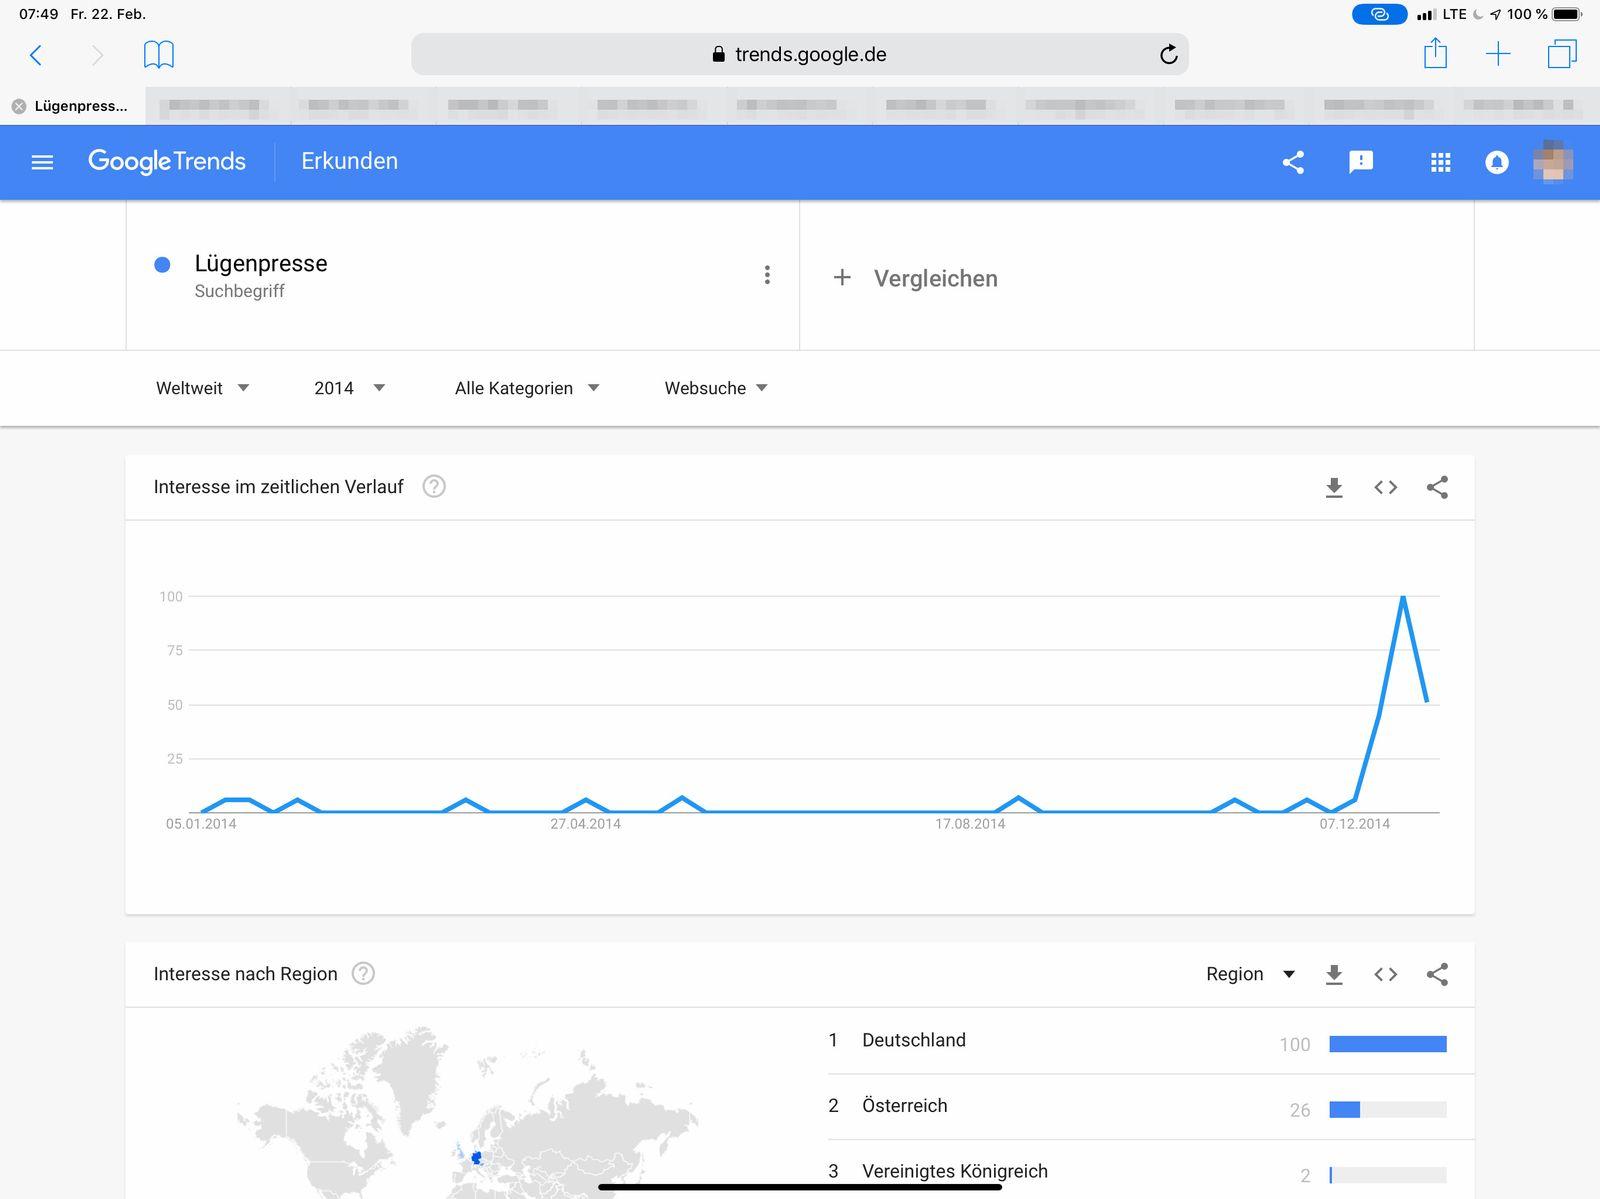 EINMALIGE VERWENDUNG SCREEN / Trends Google / 22.02.19